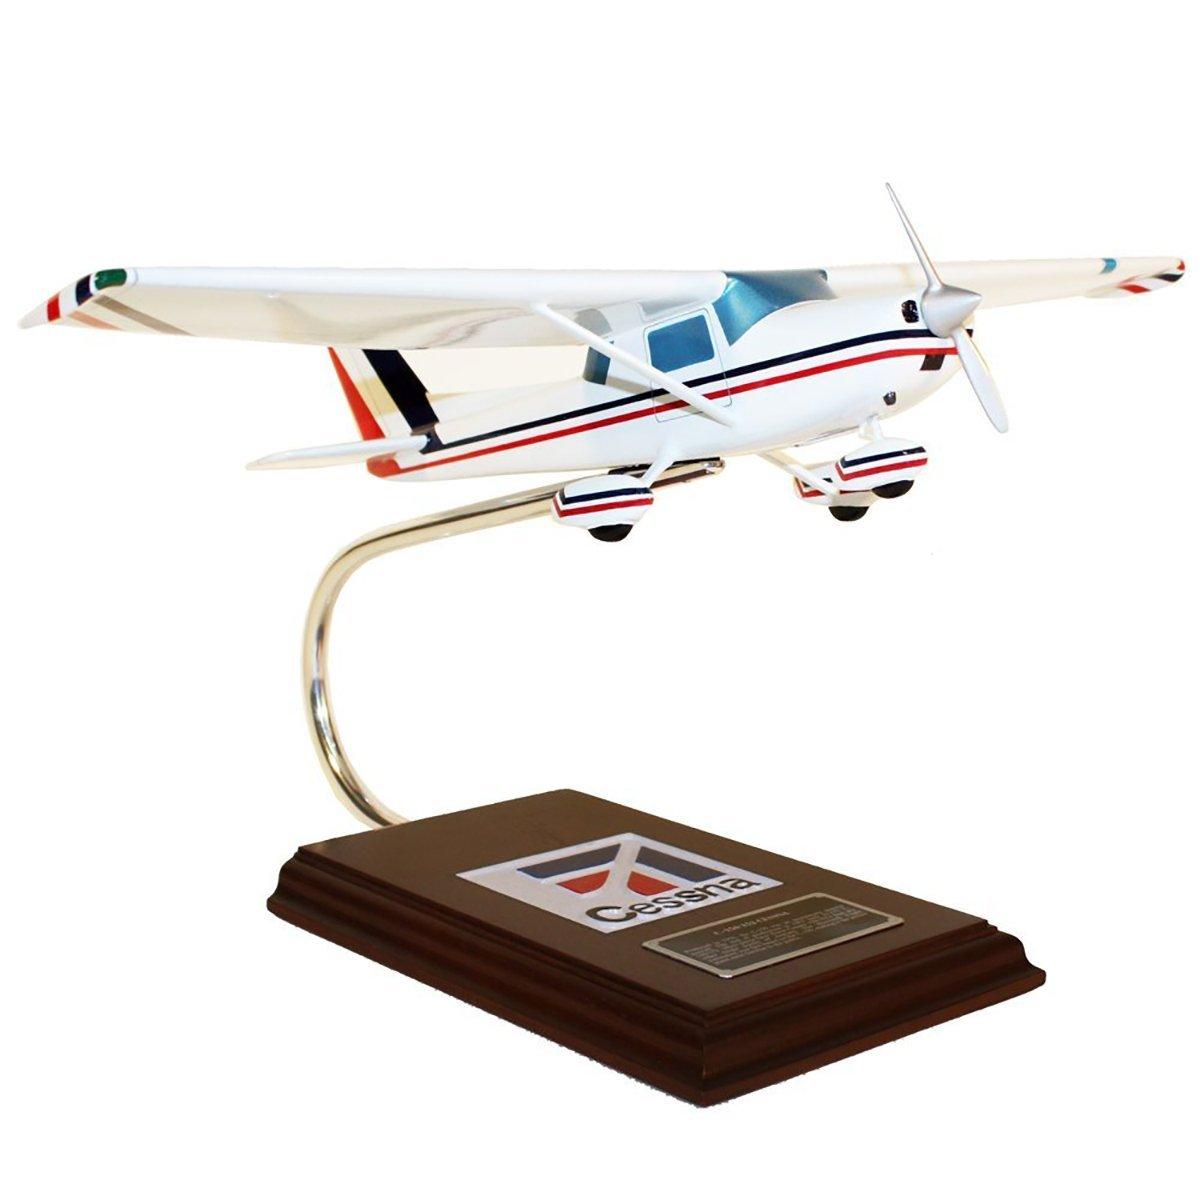 Daron Worldwide Trading ESAG003 C-150/152 1/24 AIRCRAFT